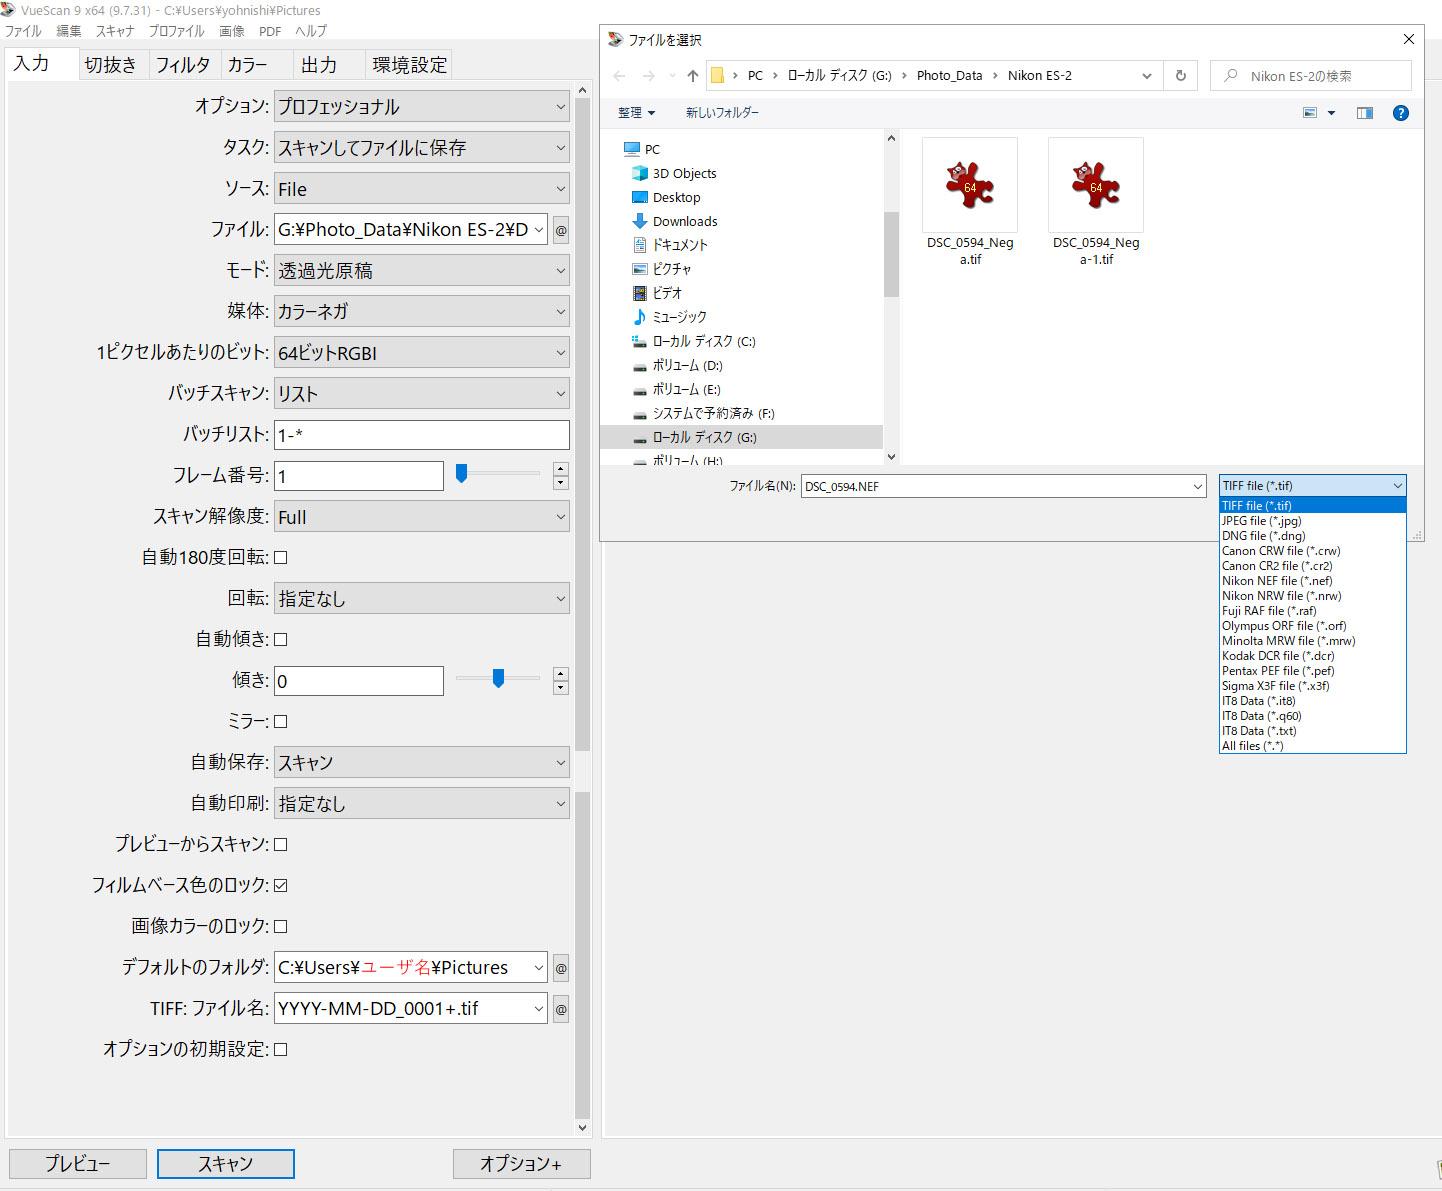 f:id:yasuo_ssi:20200823185022j:plain